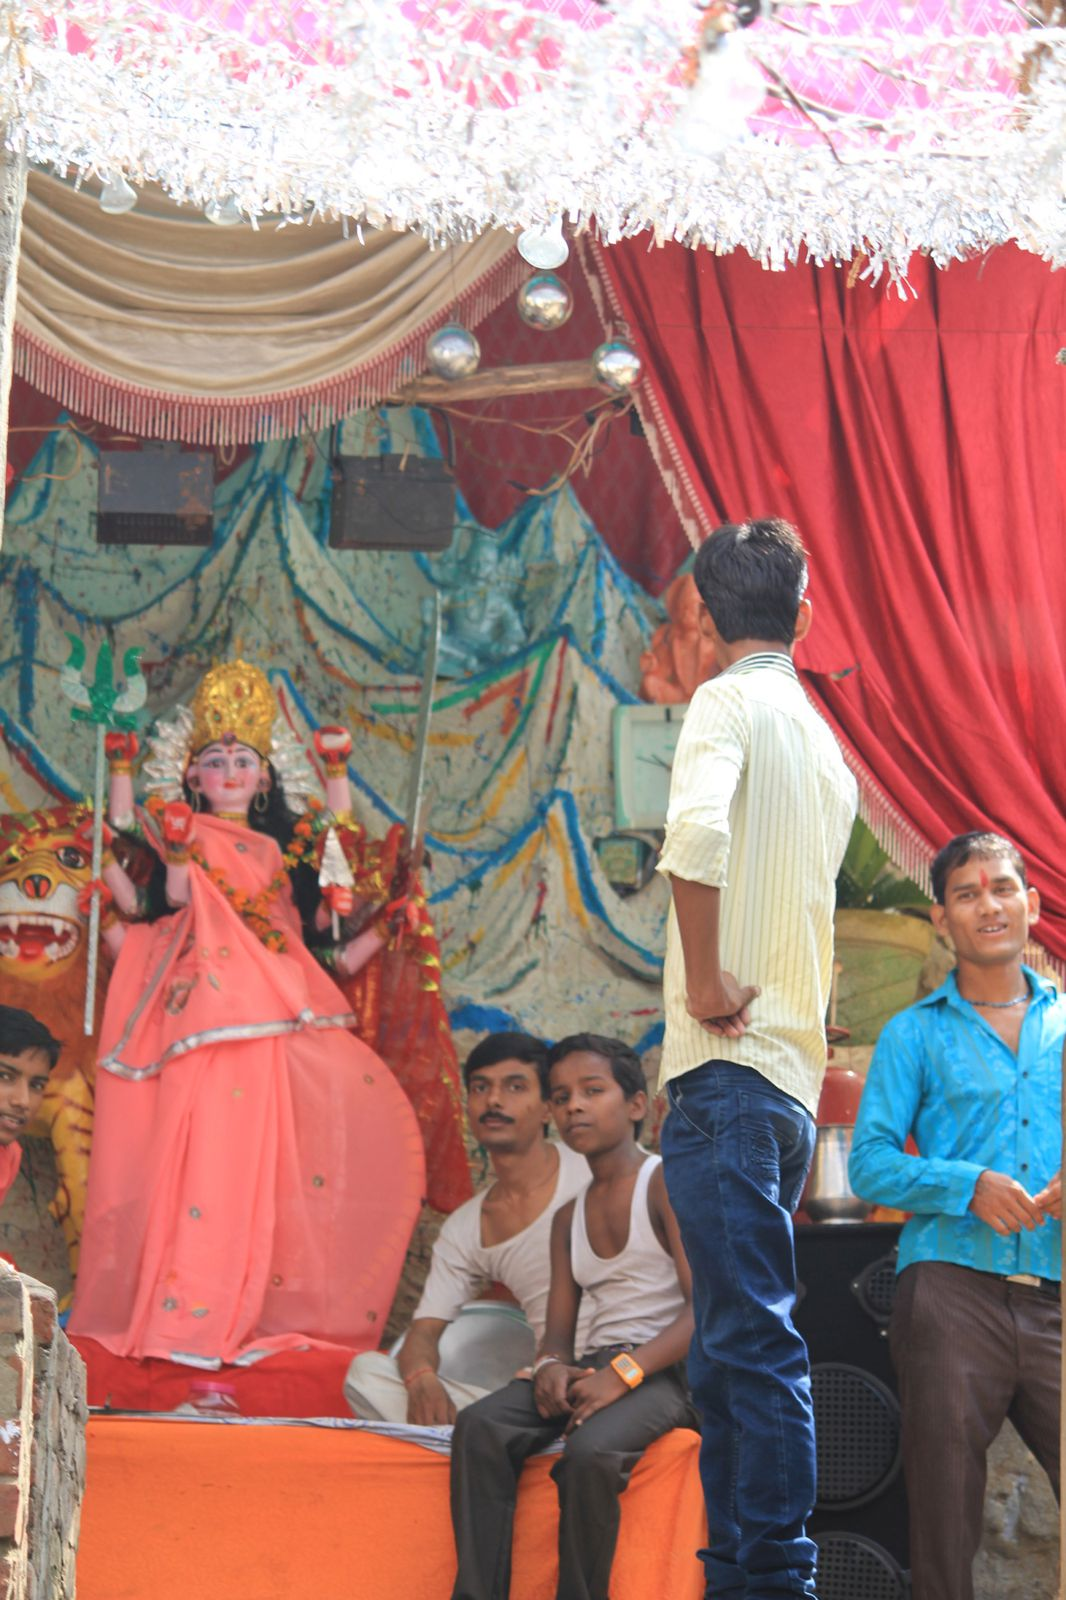 Scenes de rue: bazaar, ecole, Durga festival, moyens de transport